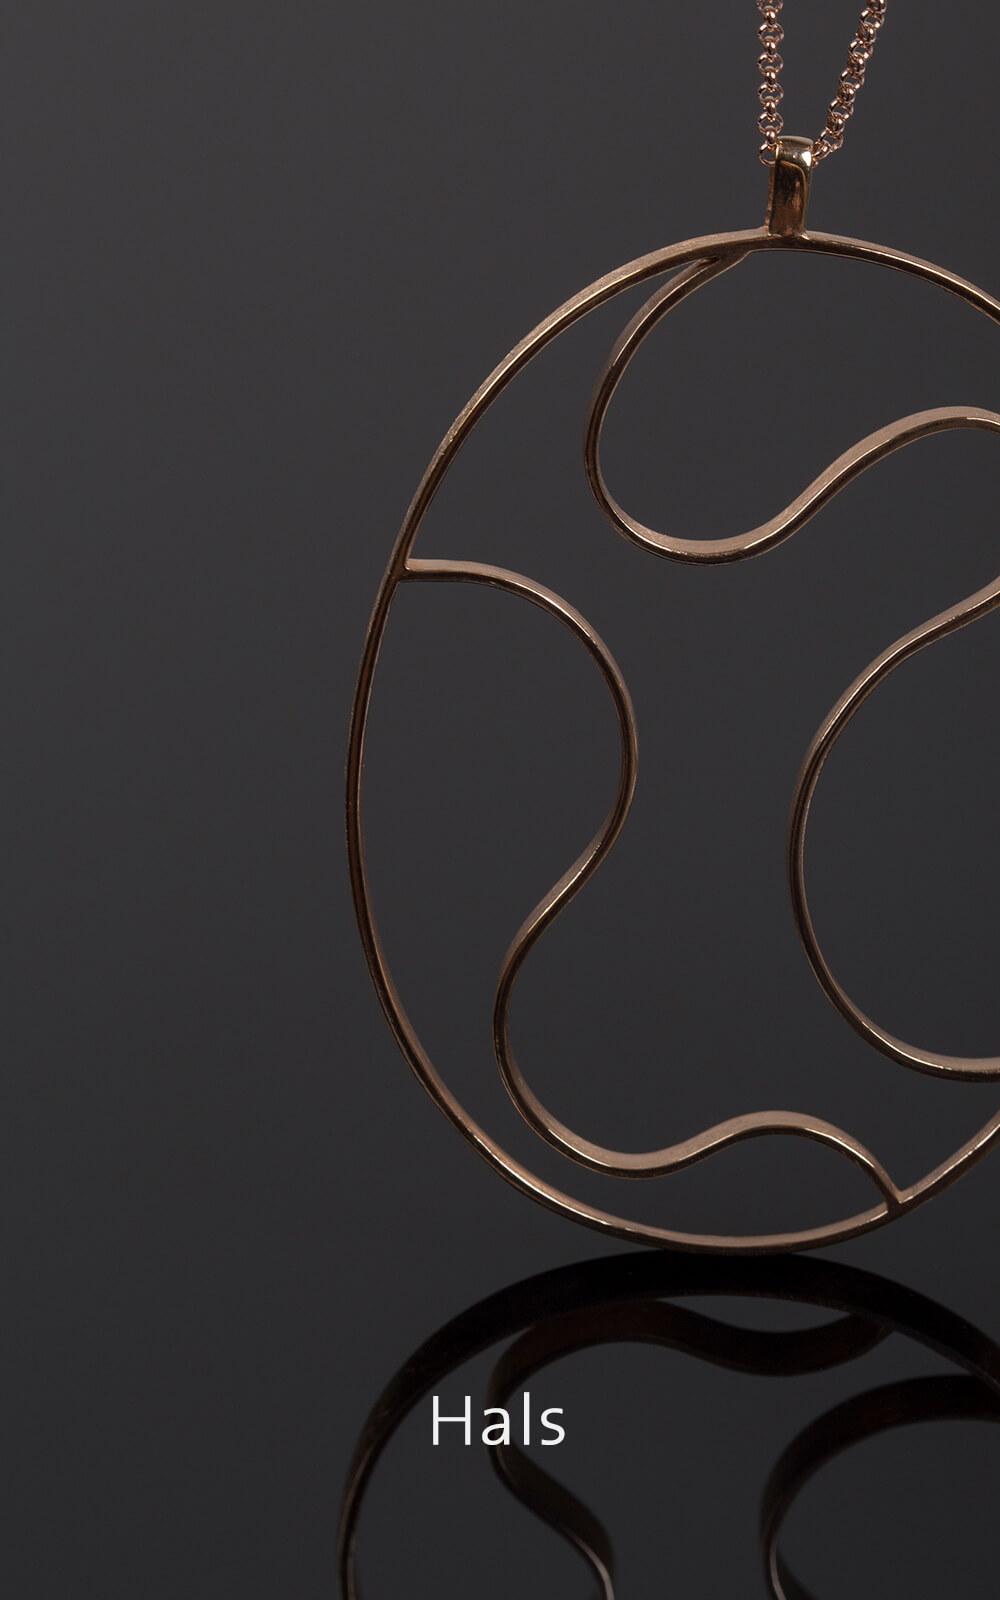 aus•gold - Kategorie - Hals